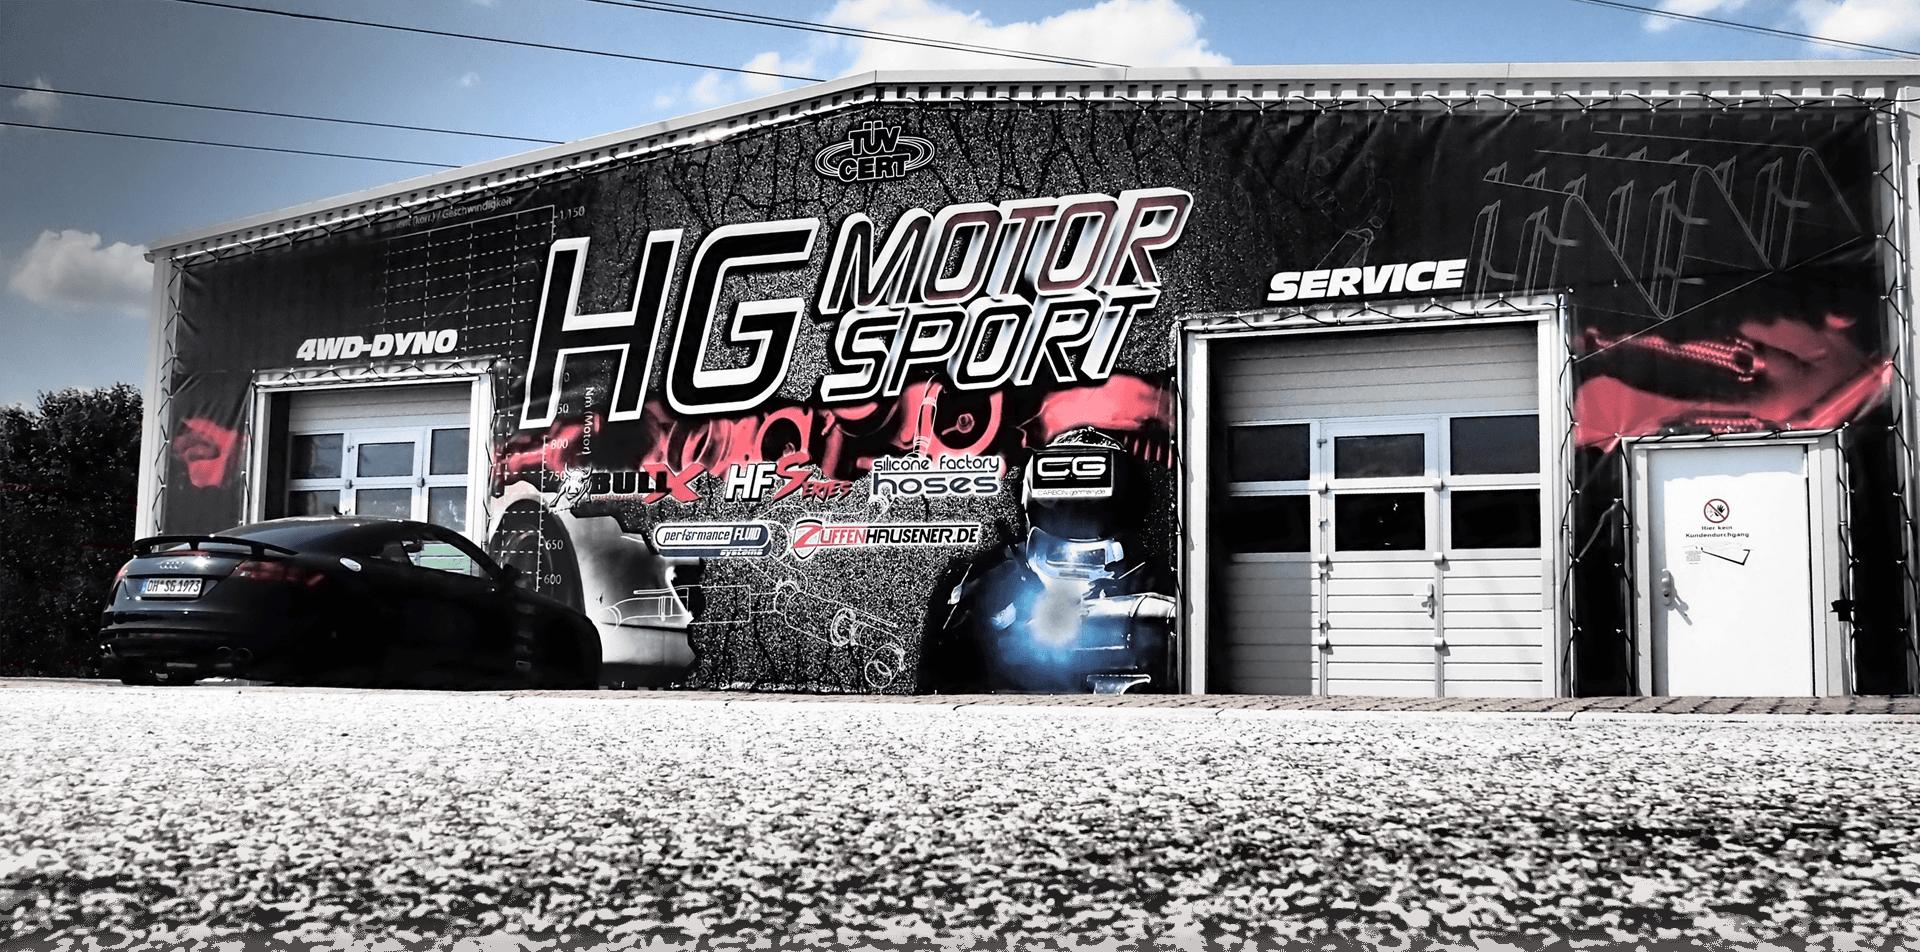 HG-Motorsport Firmengebaeude